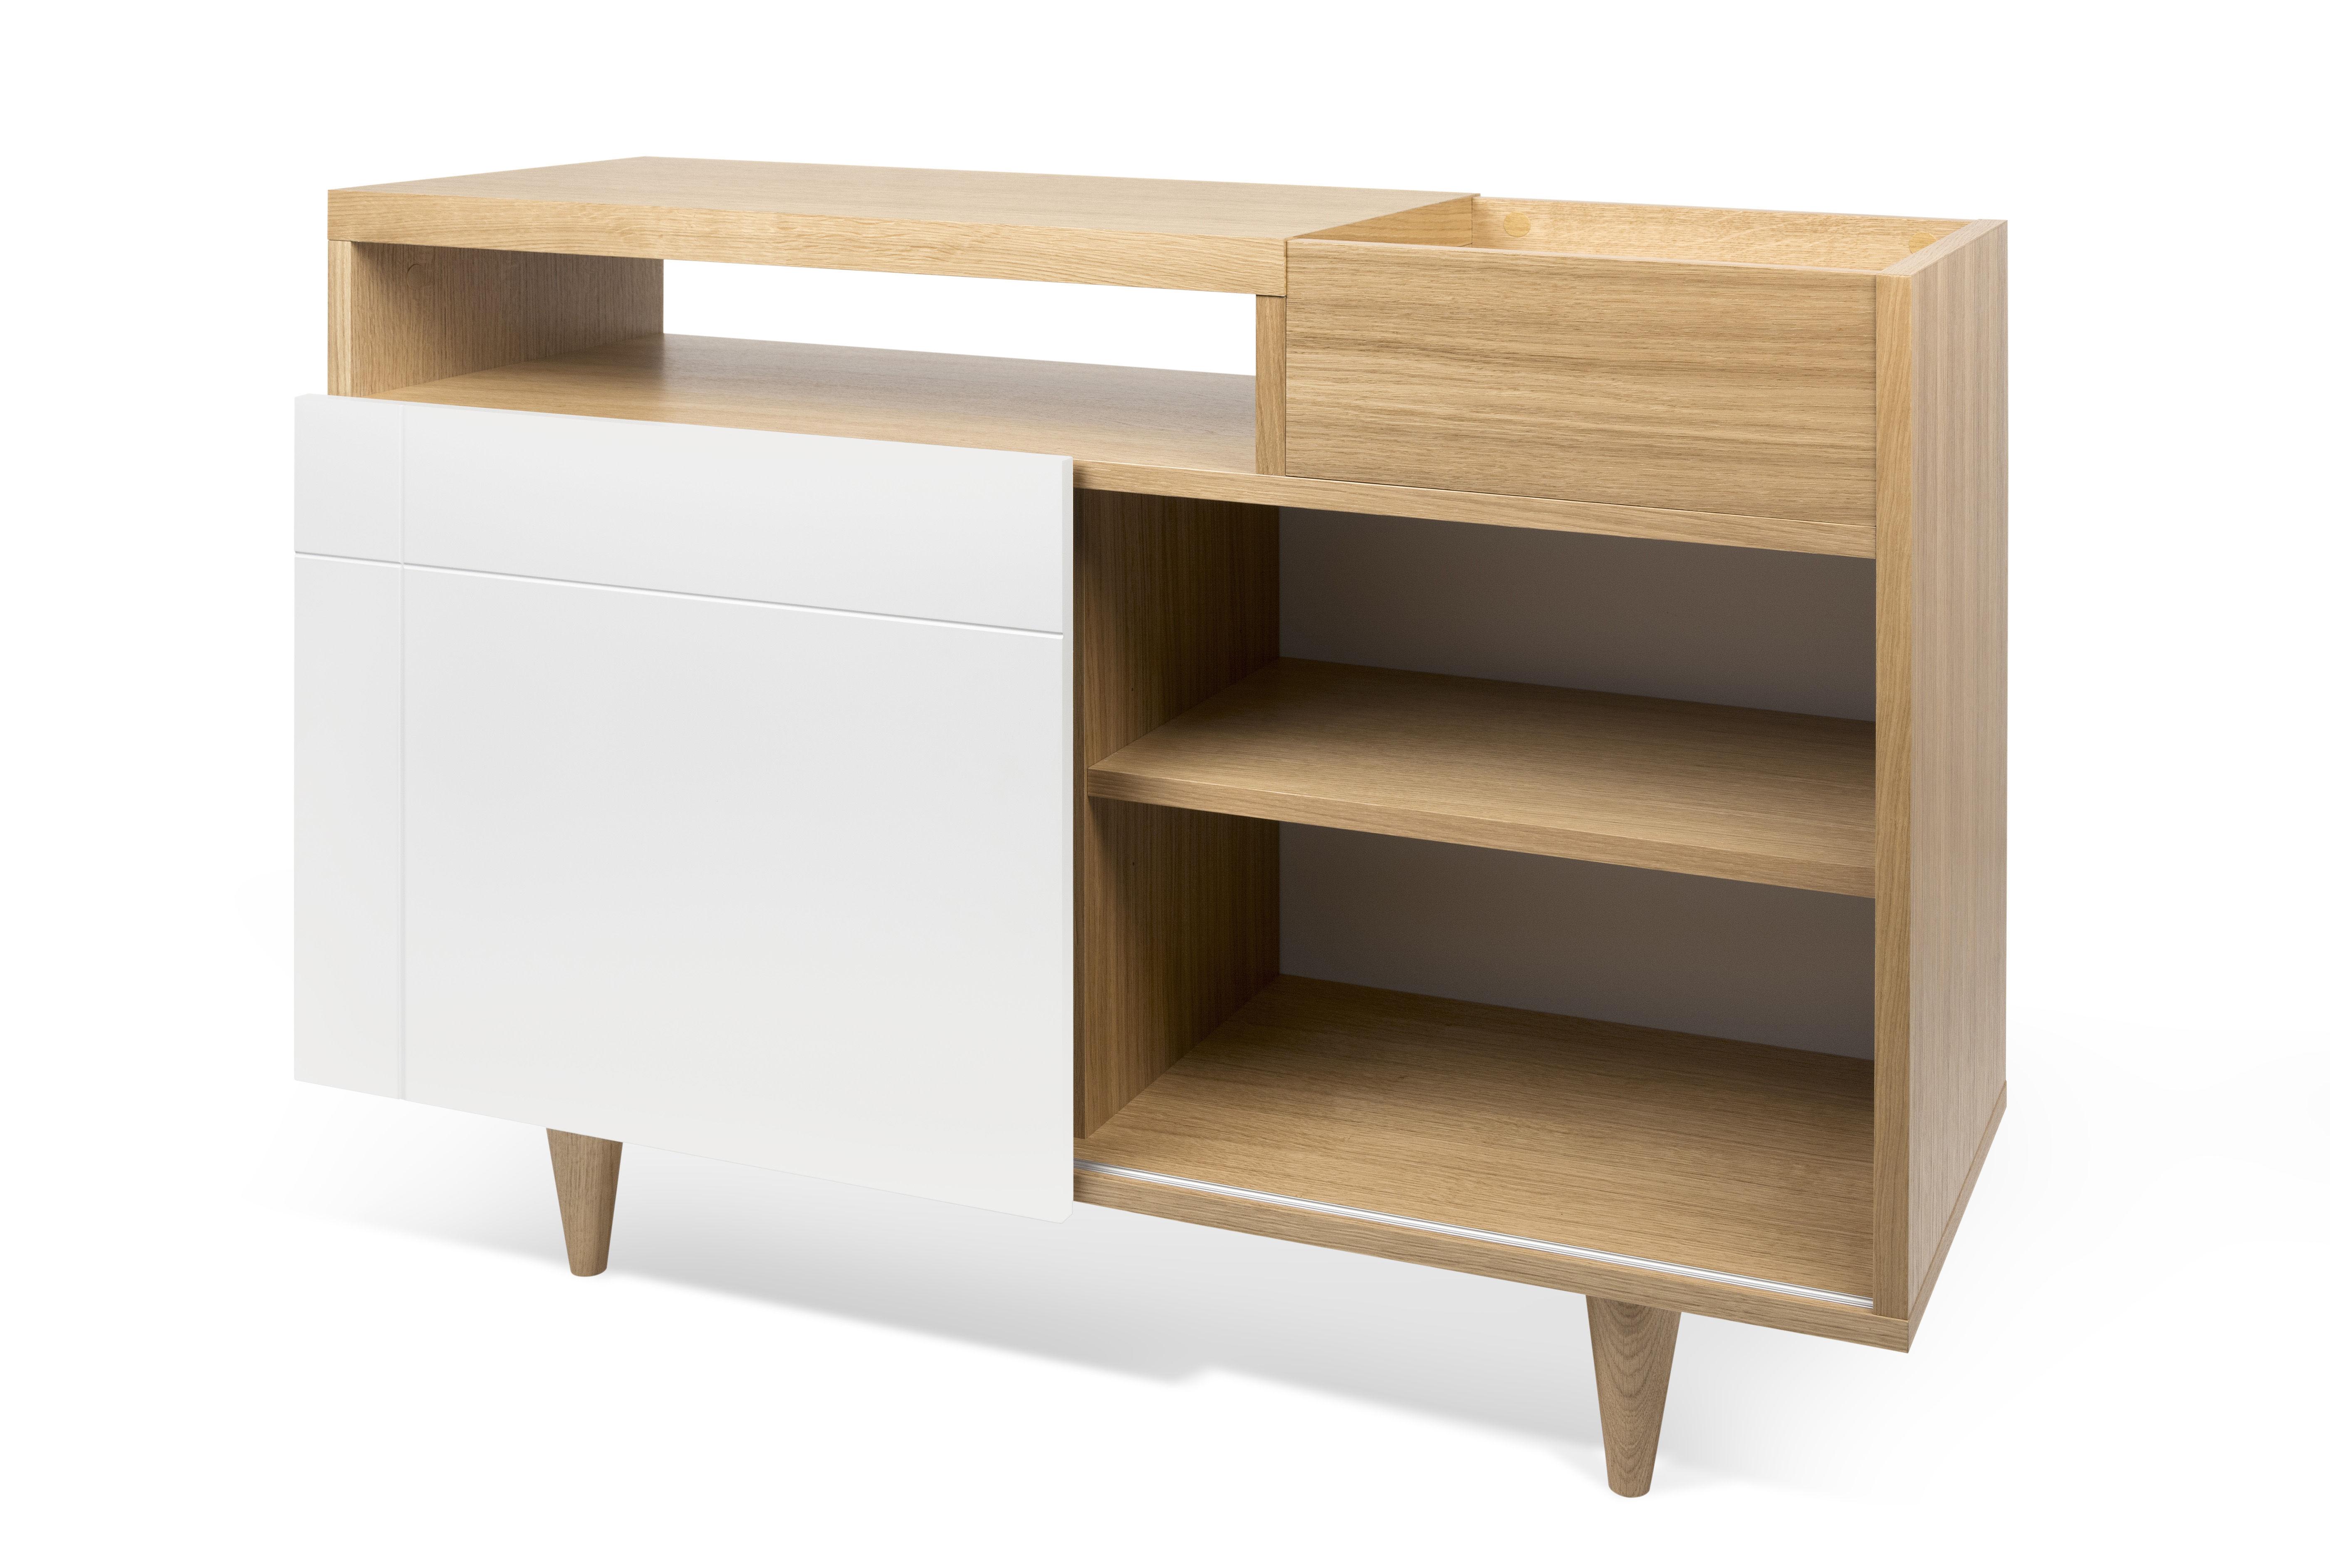 buffet slide l 110 x h 82 cm blanc ch ne pop up home. Black Bedroom Furniture Sets. Home Design Ideas